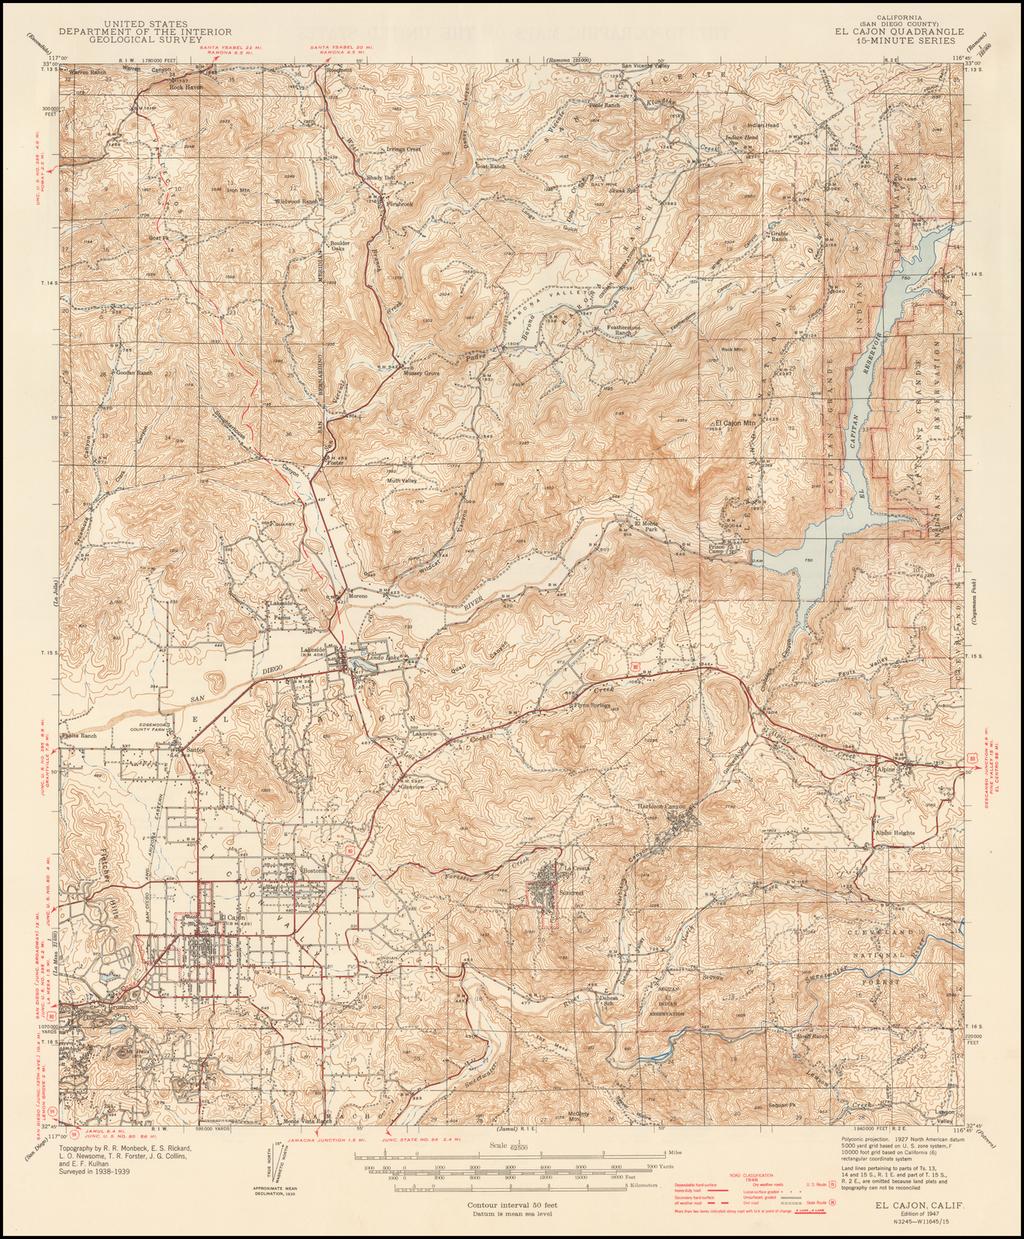 El Cajon Quadrangle 7 1/2-Minute Series By U.S. Geological Survey